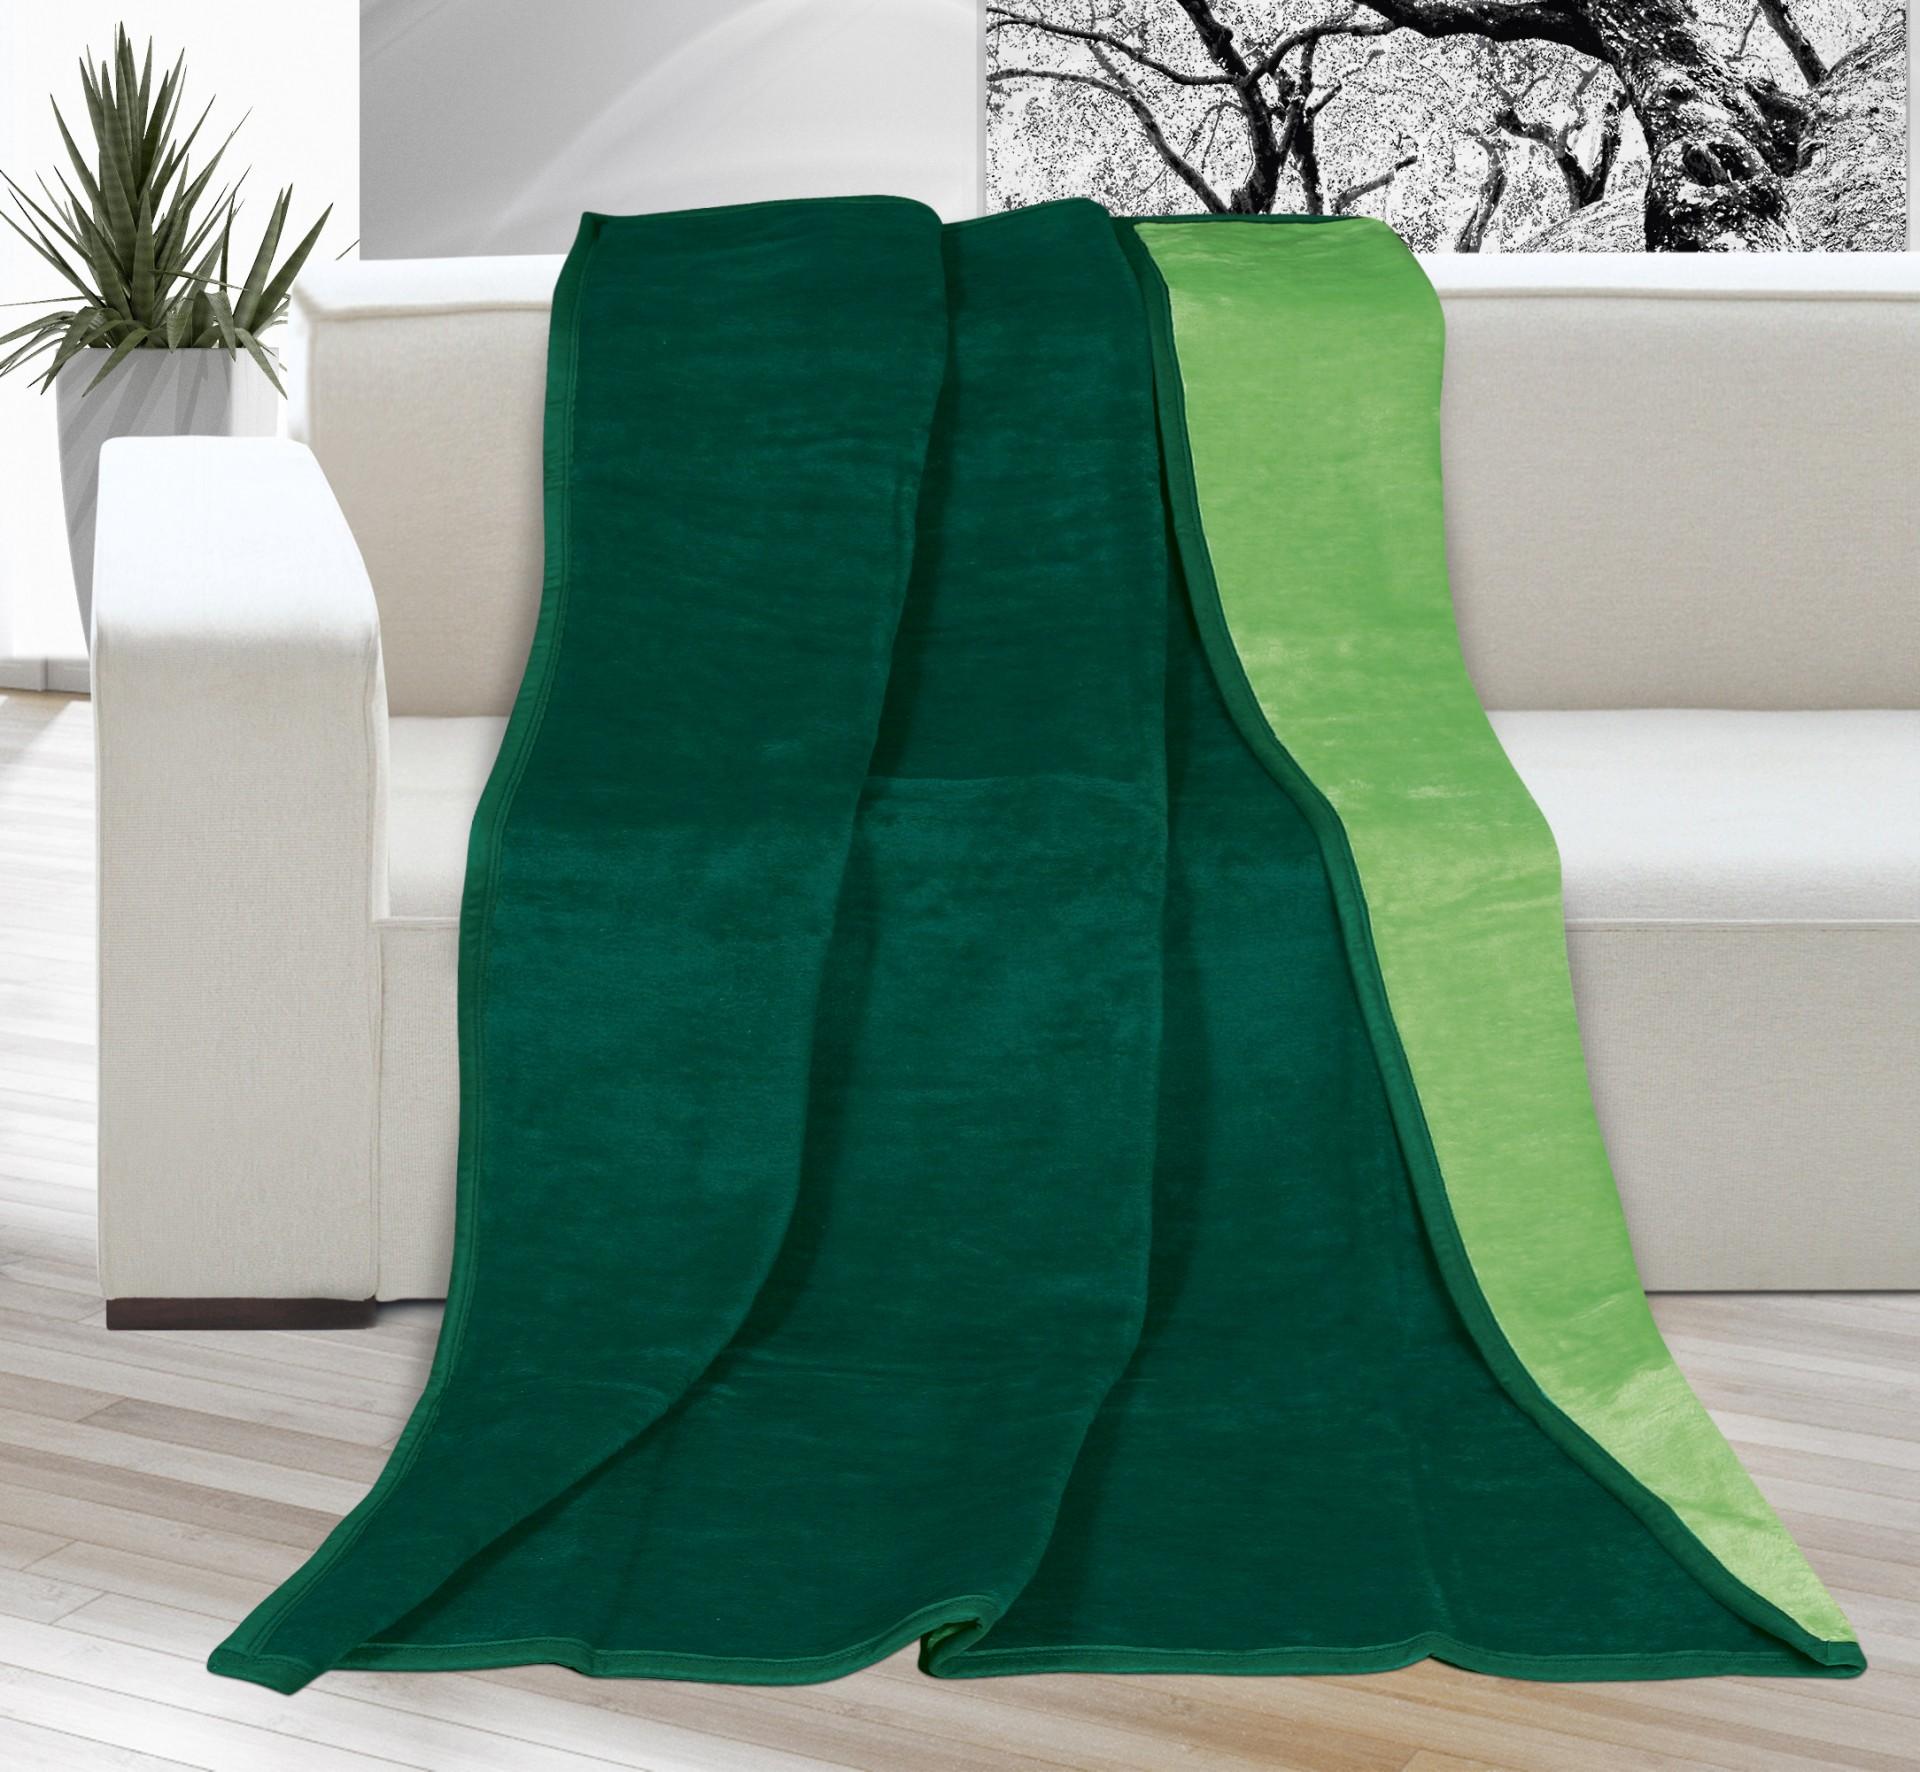 Deka Kira PLUS jednolůžko 150x200cm tm.zelená/zelená